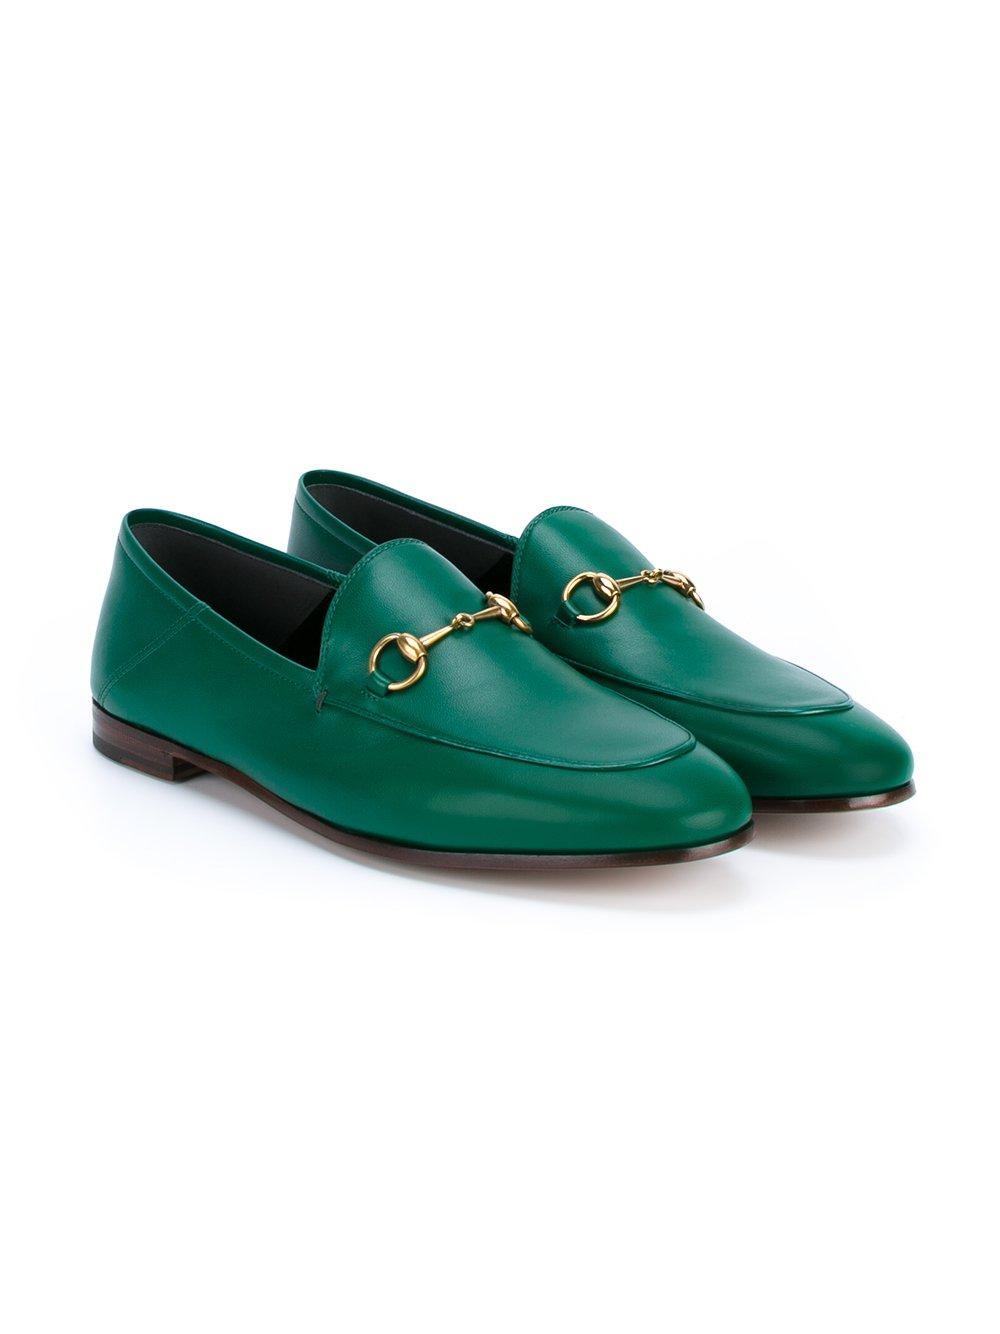 Green Shoes Australia